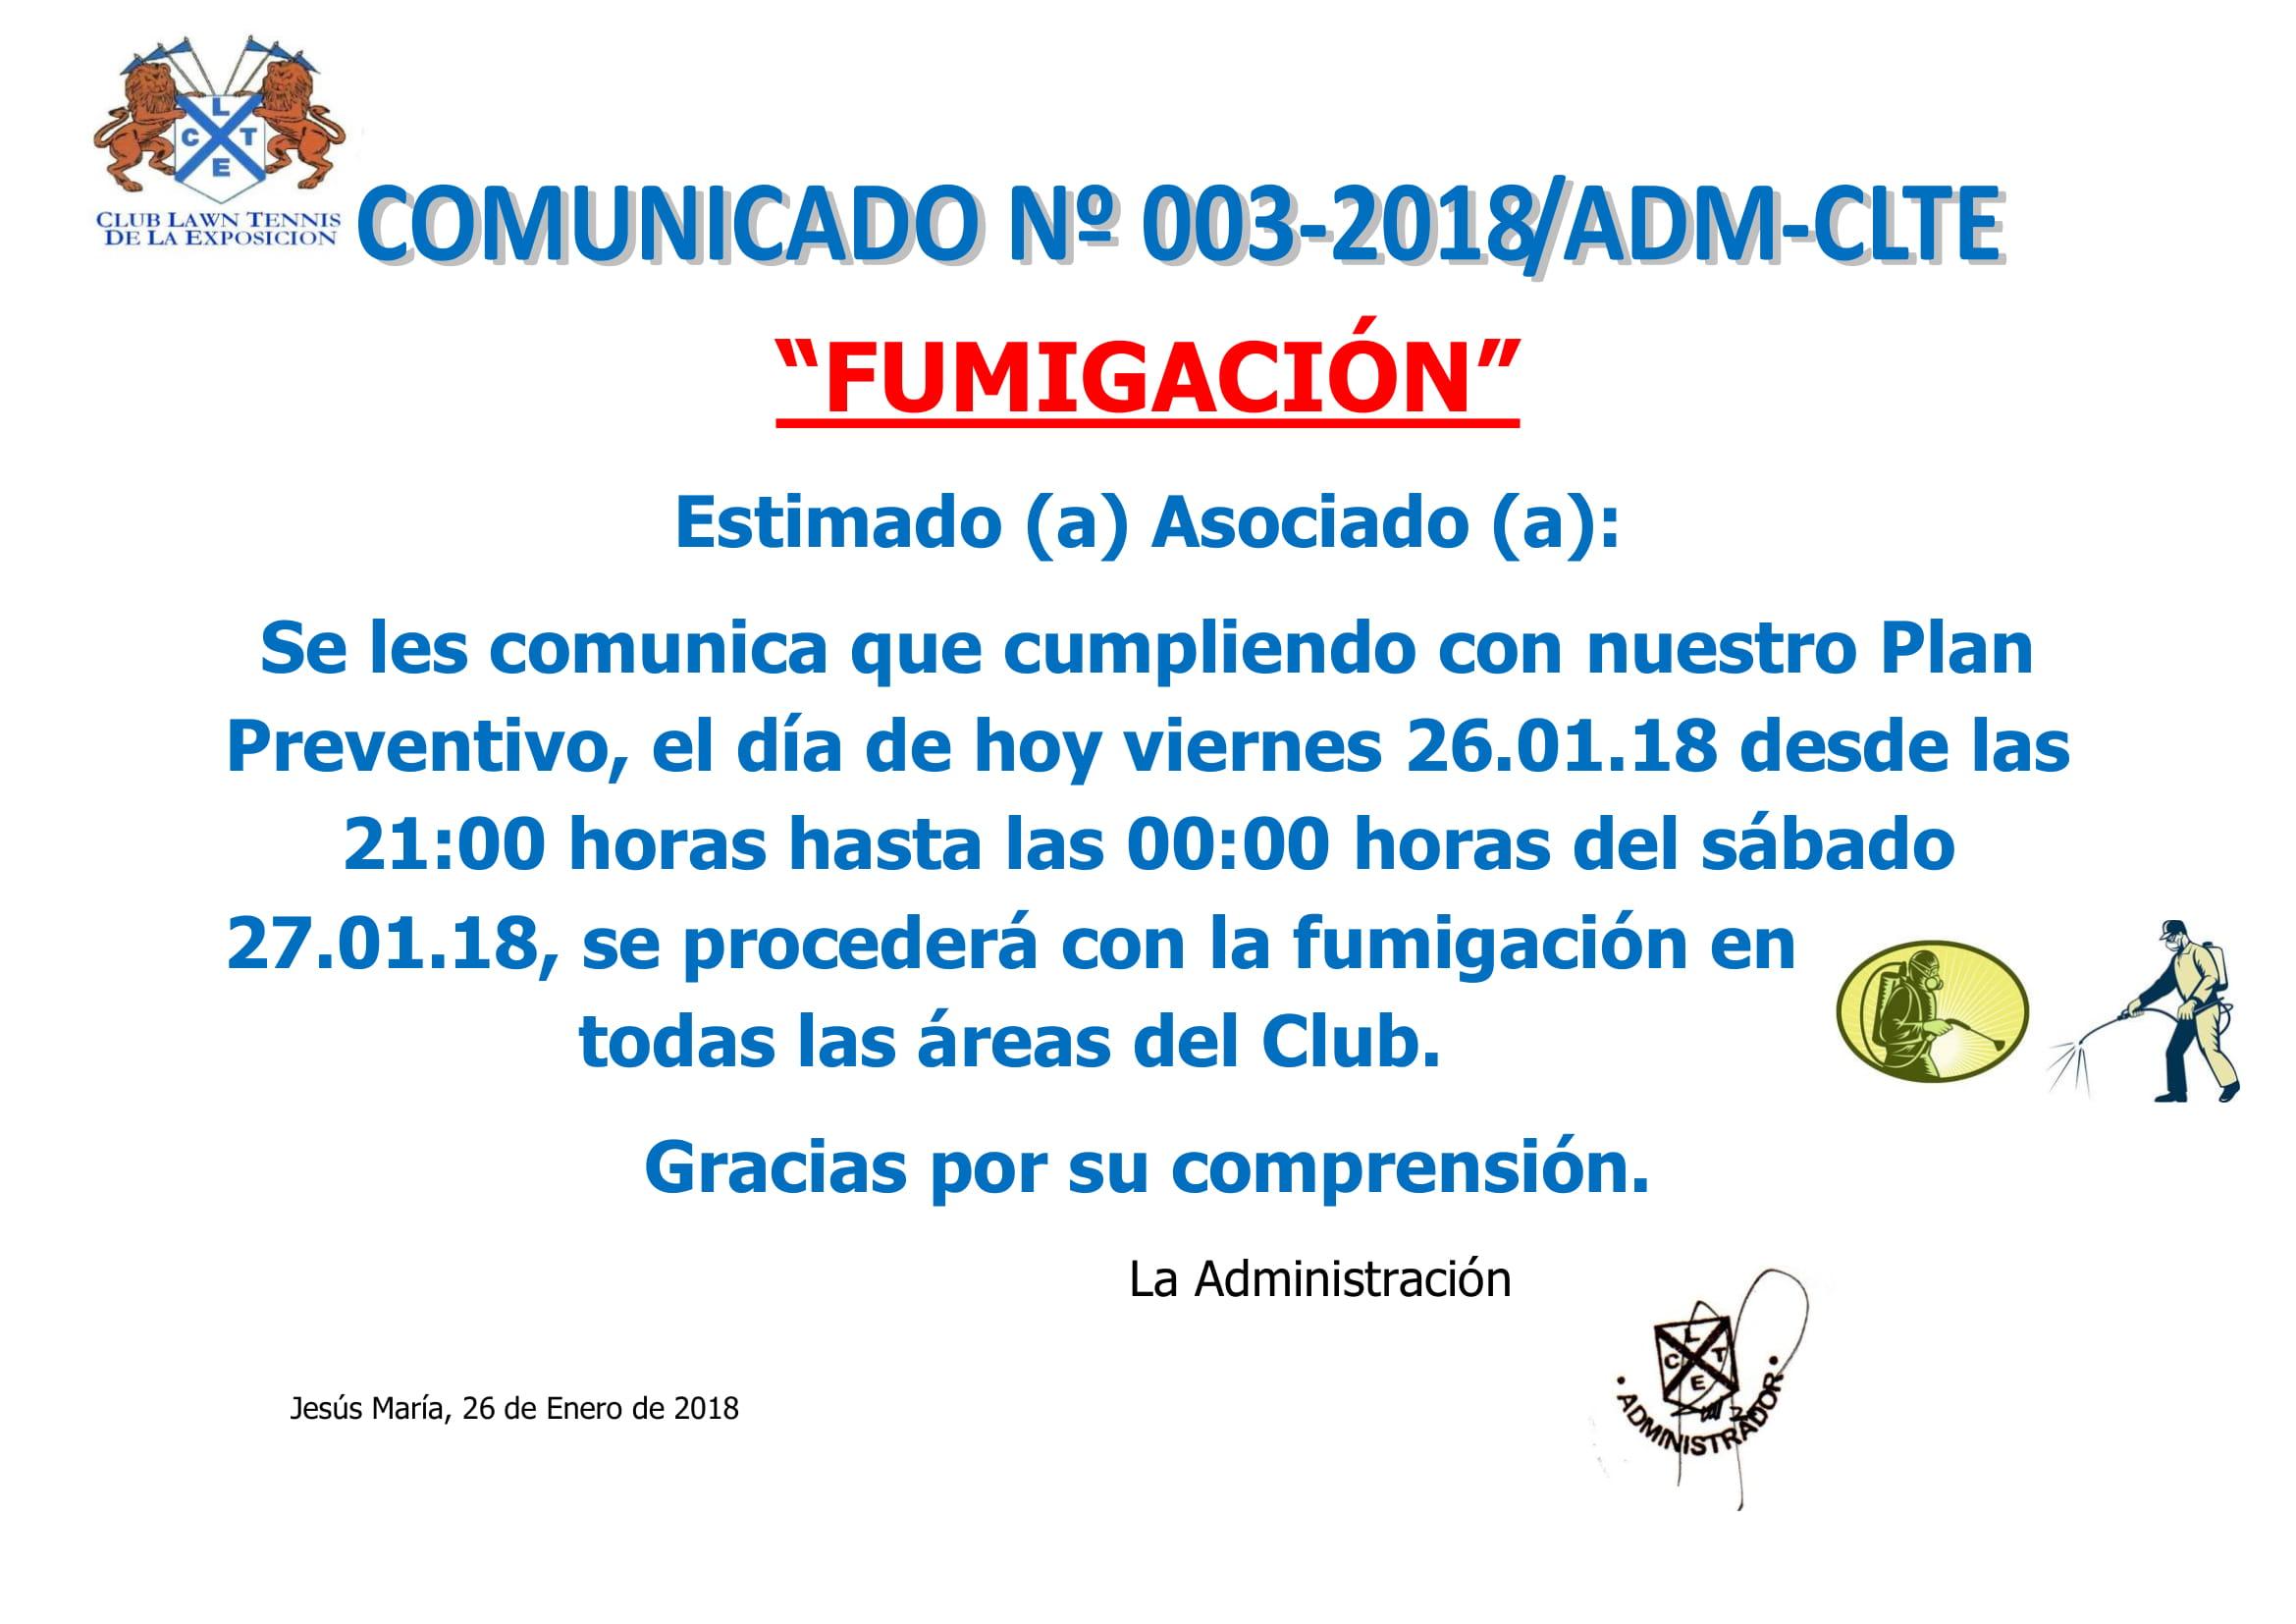 Comunicado 003-2018 ADM-CLTE - FUMIGACIÓN